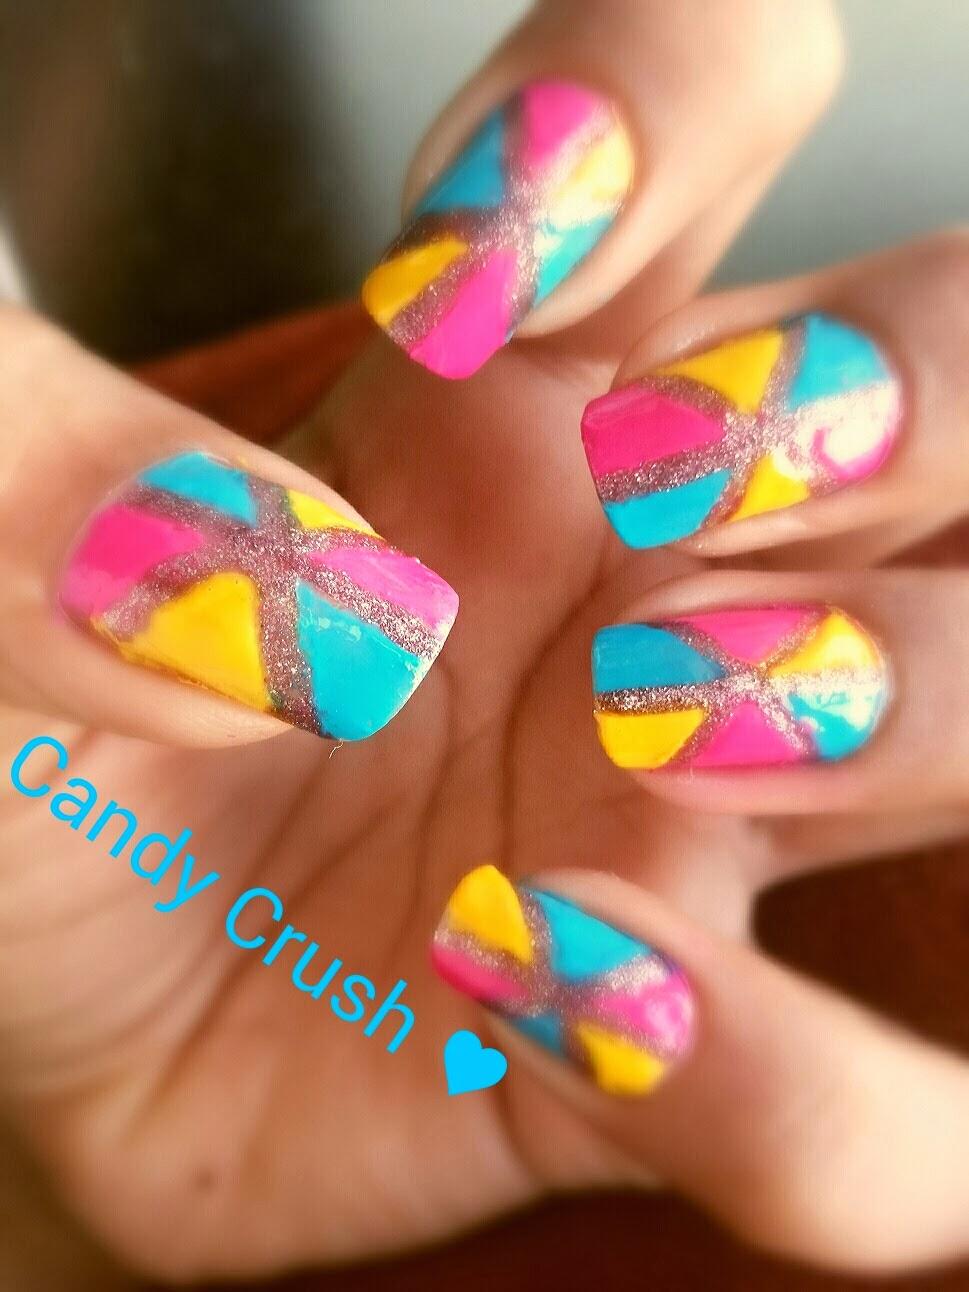 Teen Beauty Candy Crush Nail Art